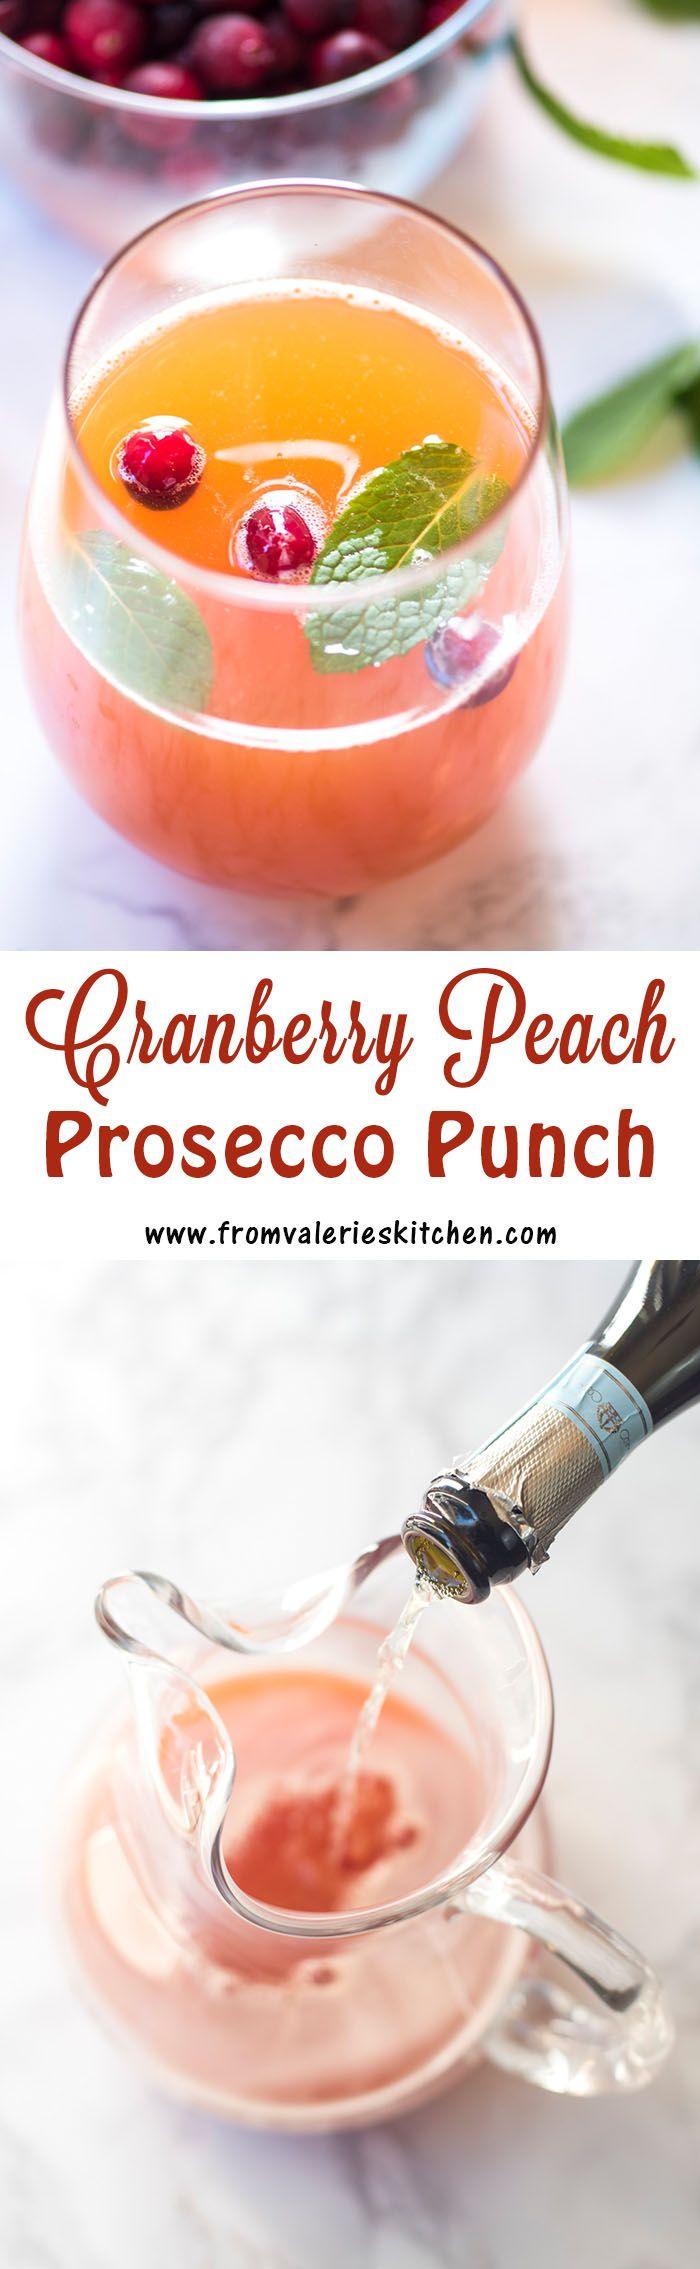 Cranberry Peach Prosecco Punch